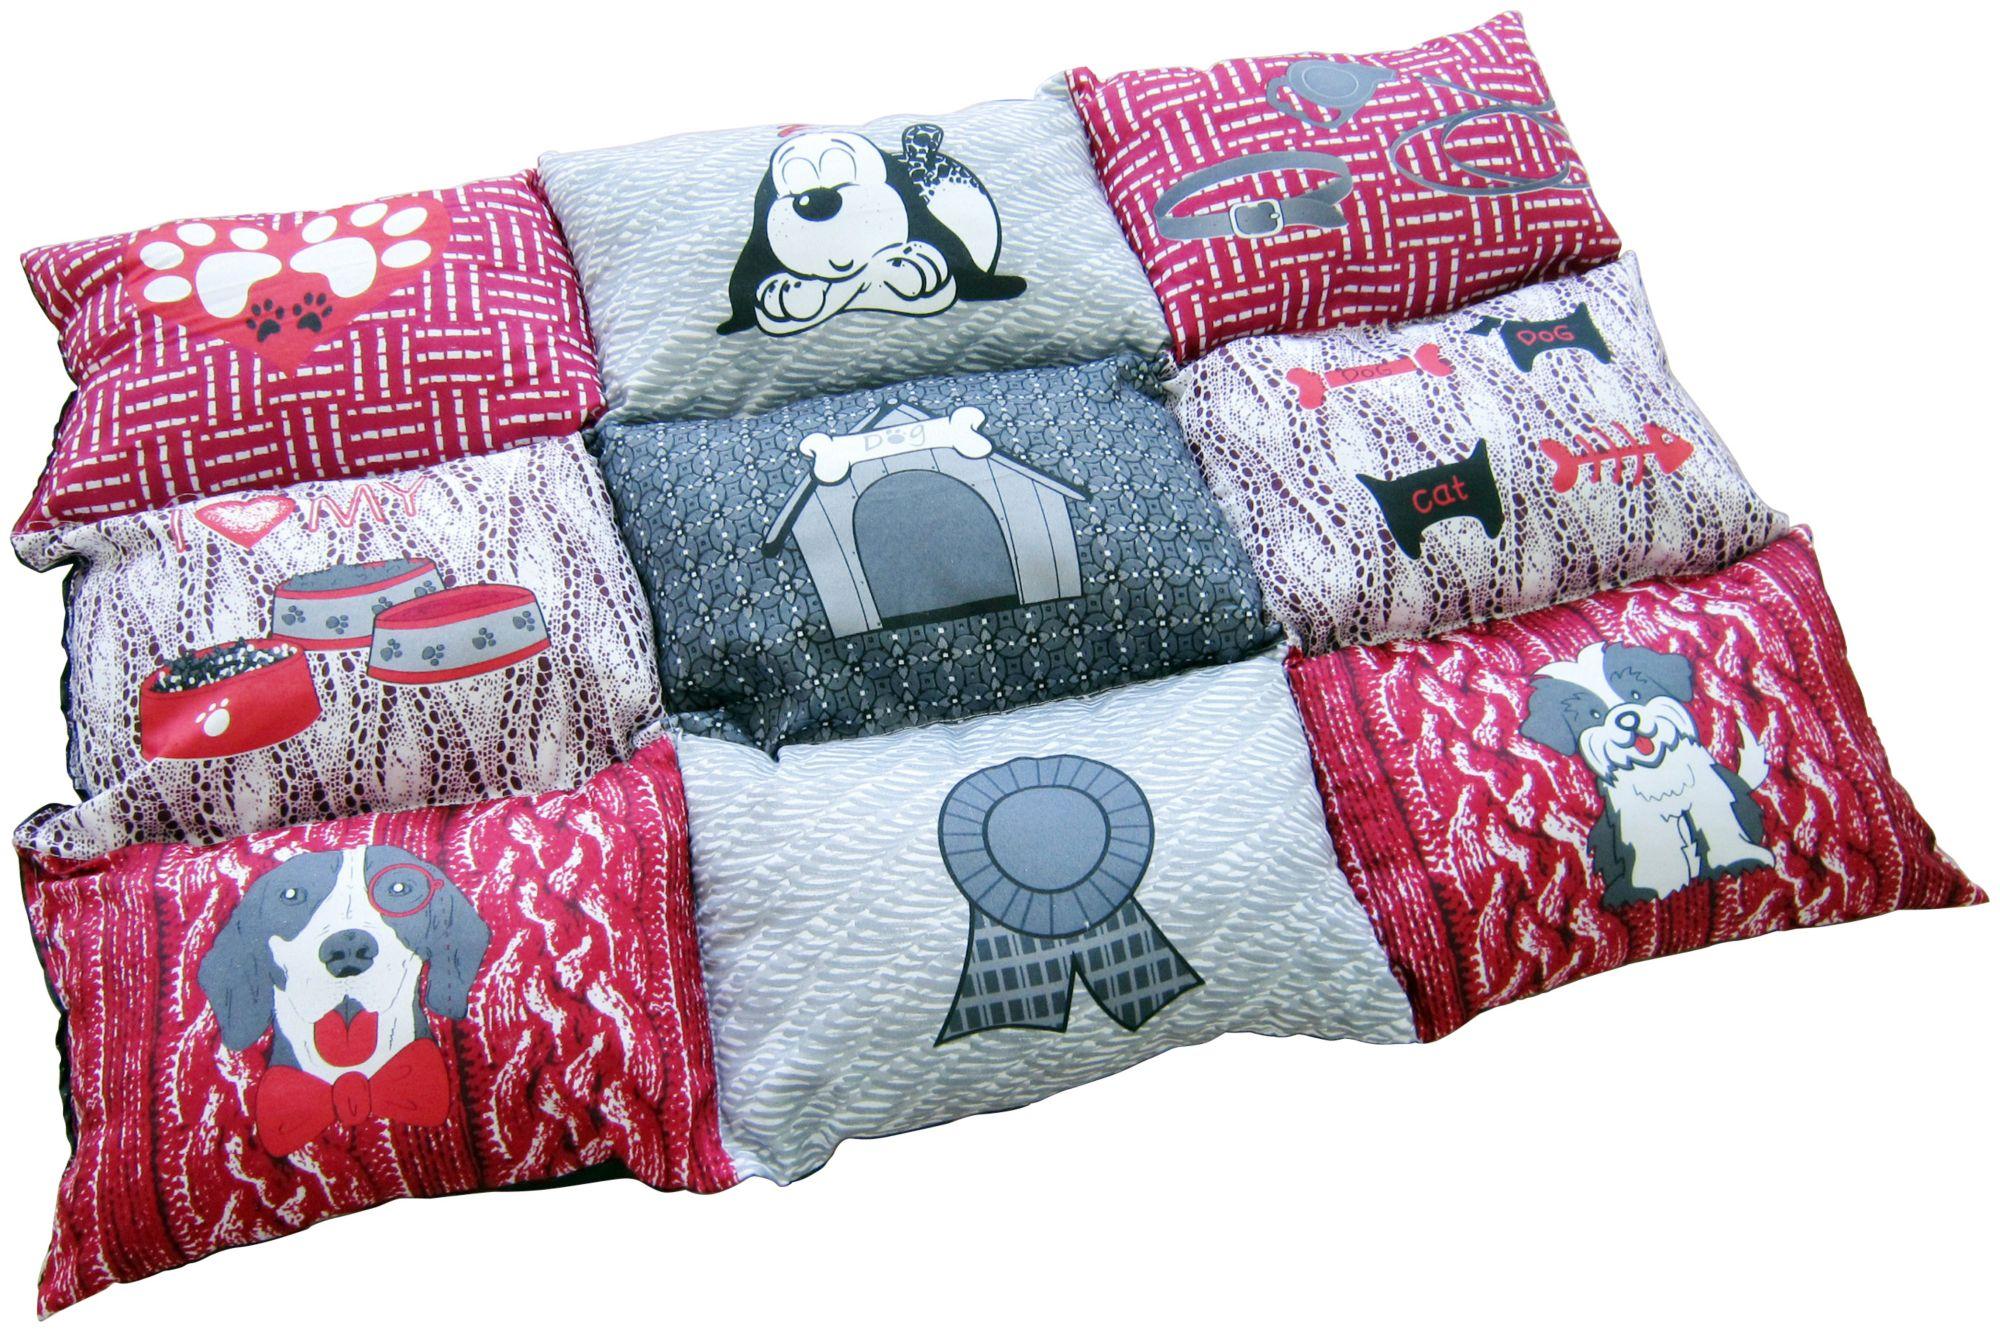 HEIM  Hunde-Decke »Patchwork«, BxL: 55x80 cm, gesteppt, rot